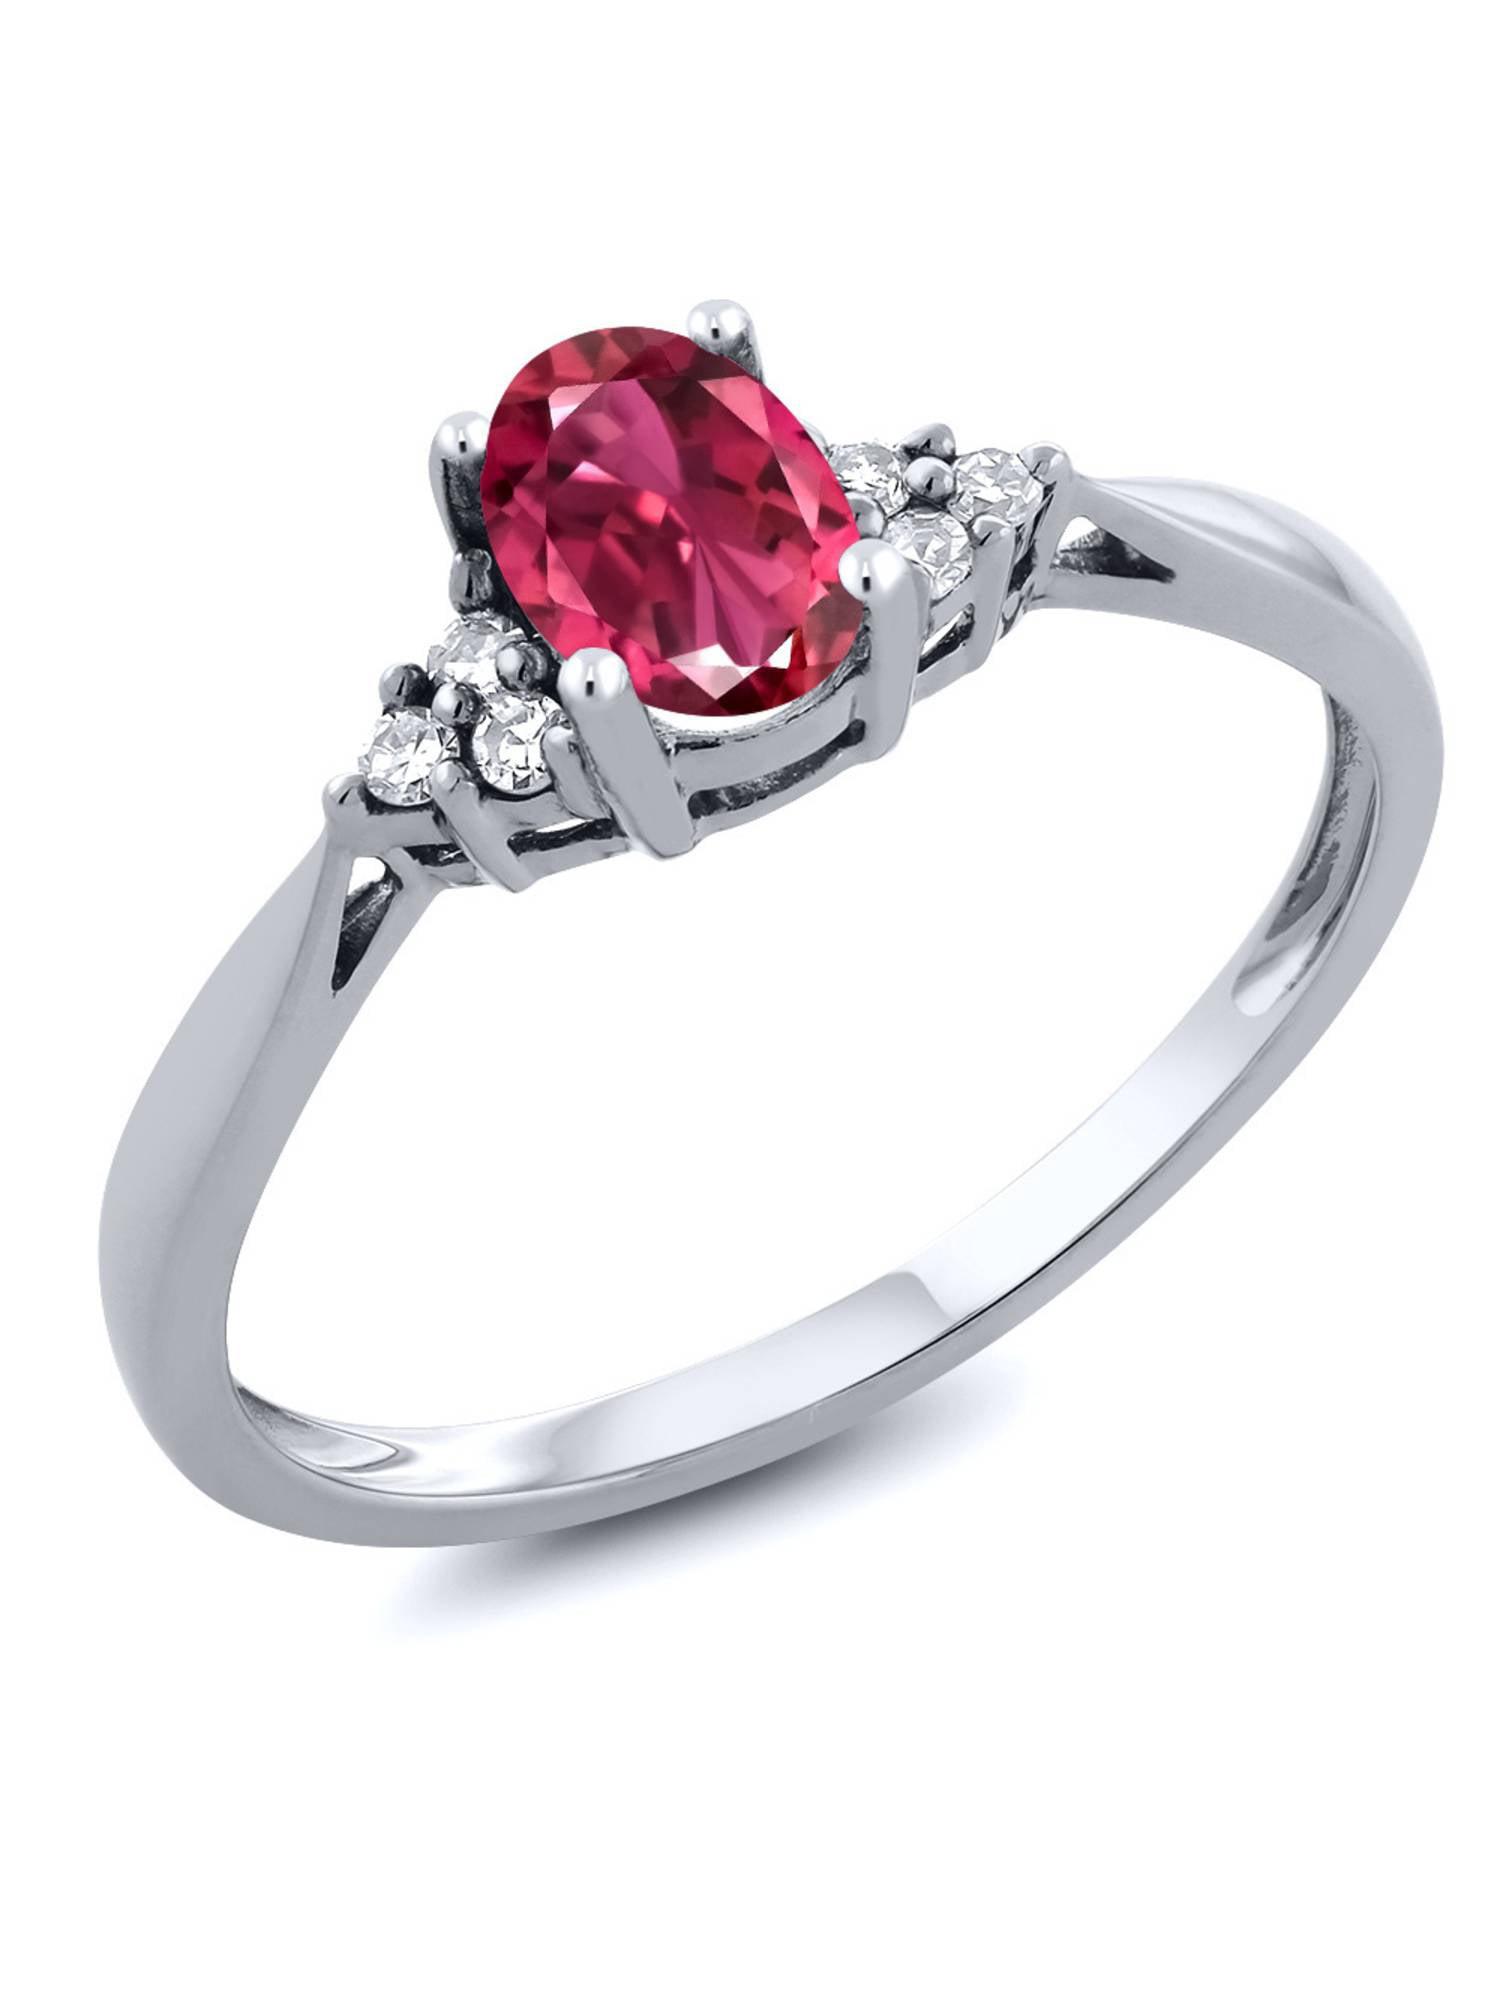 Women's 14K White Gold Pink Tourmaline and Diamond Ring by